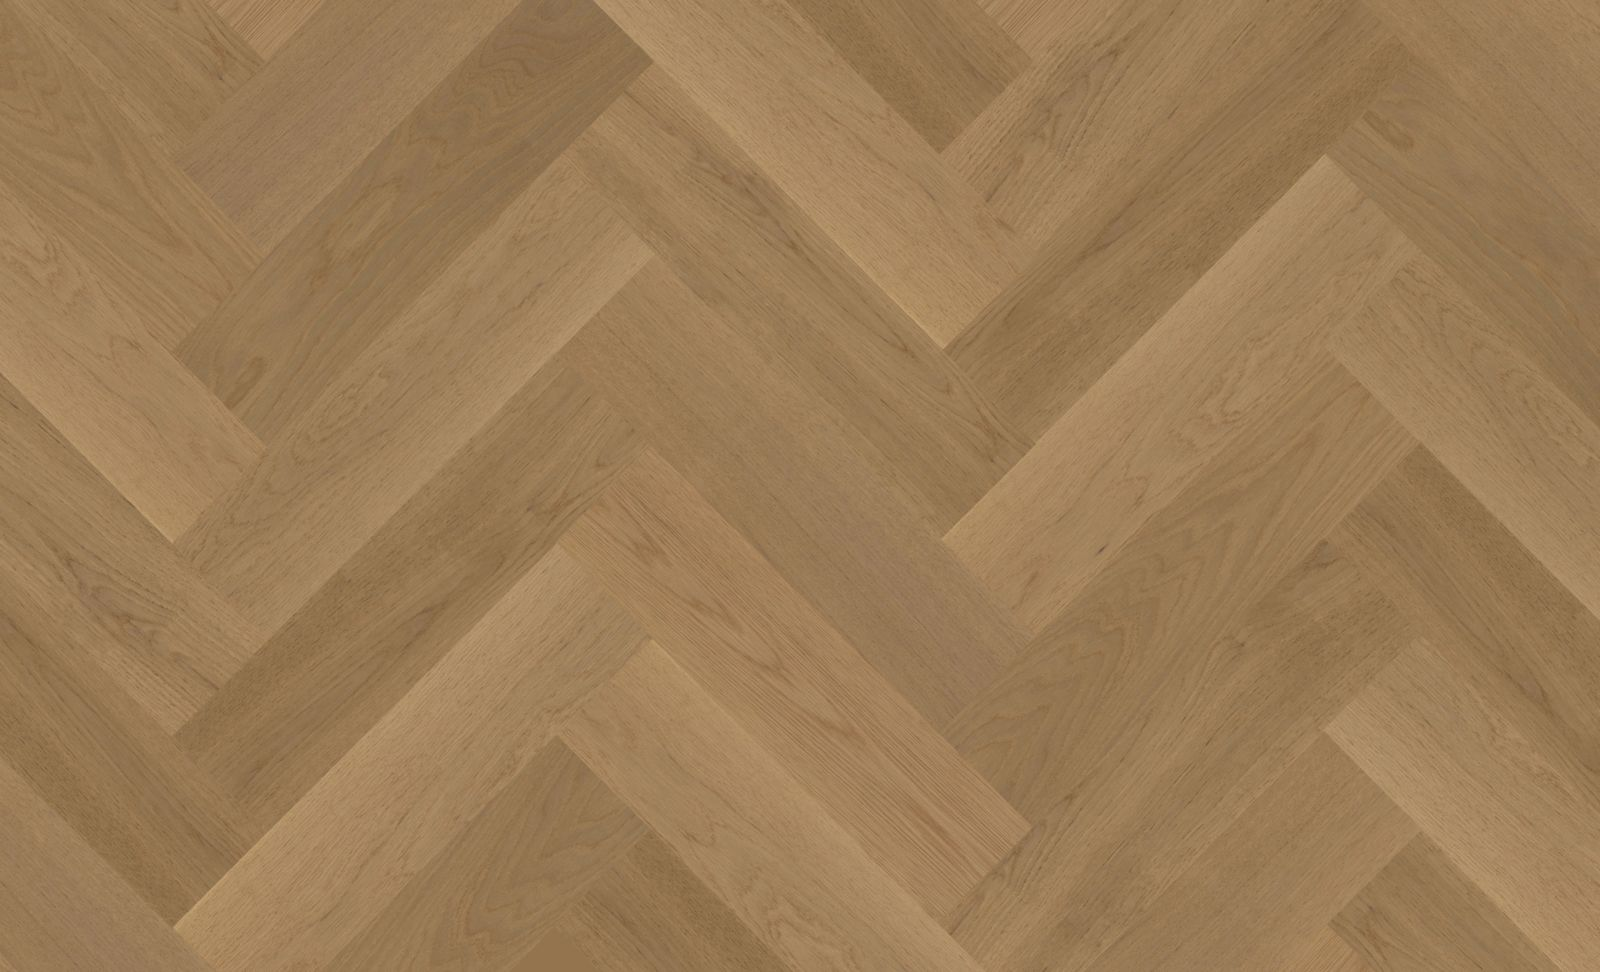 Mercier Wood Flooring White Oak Hush WHTKHSH